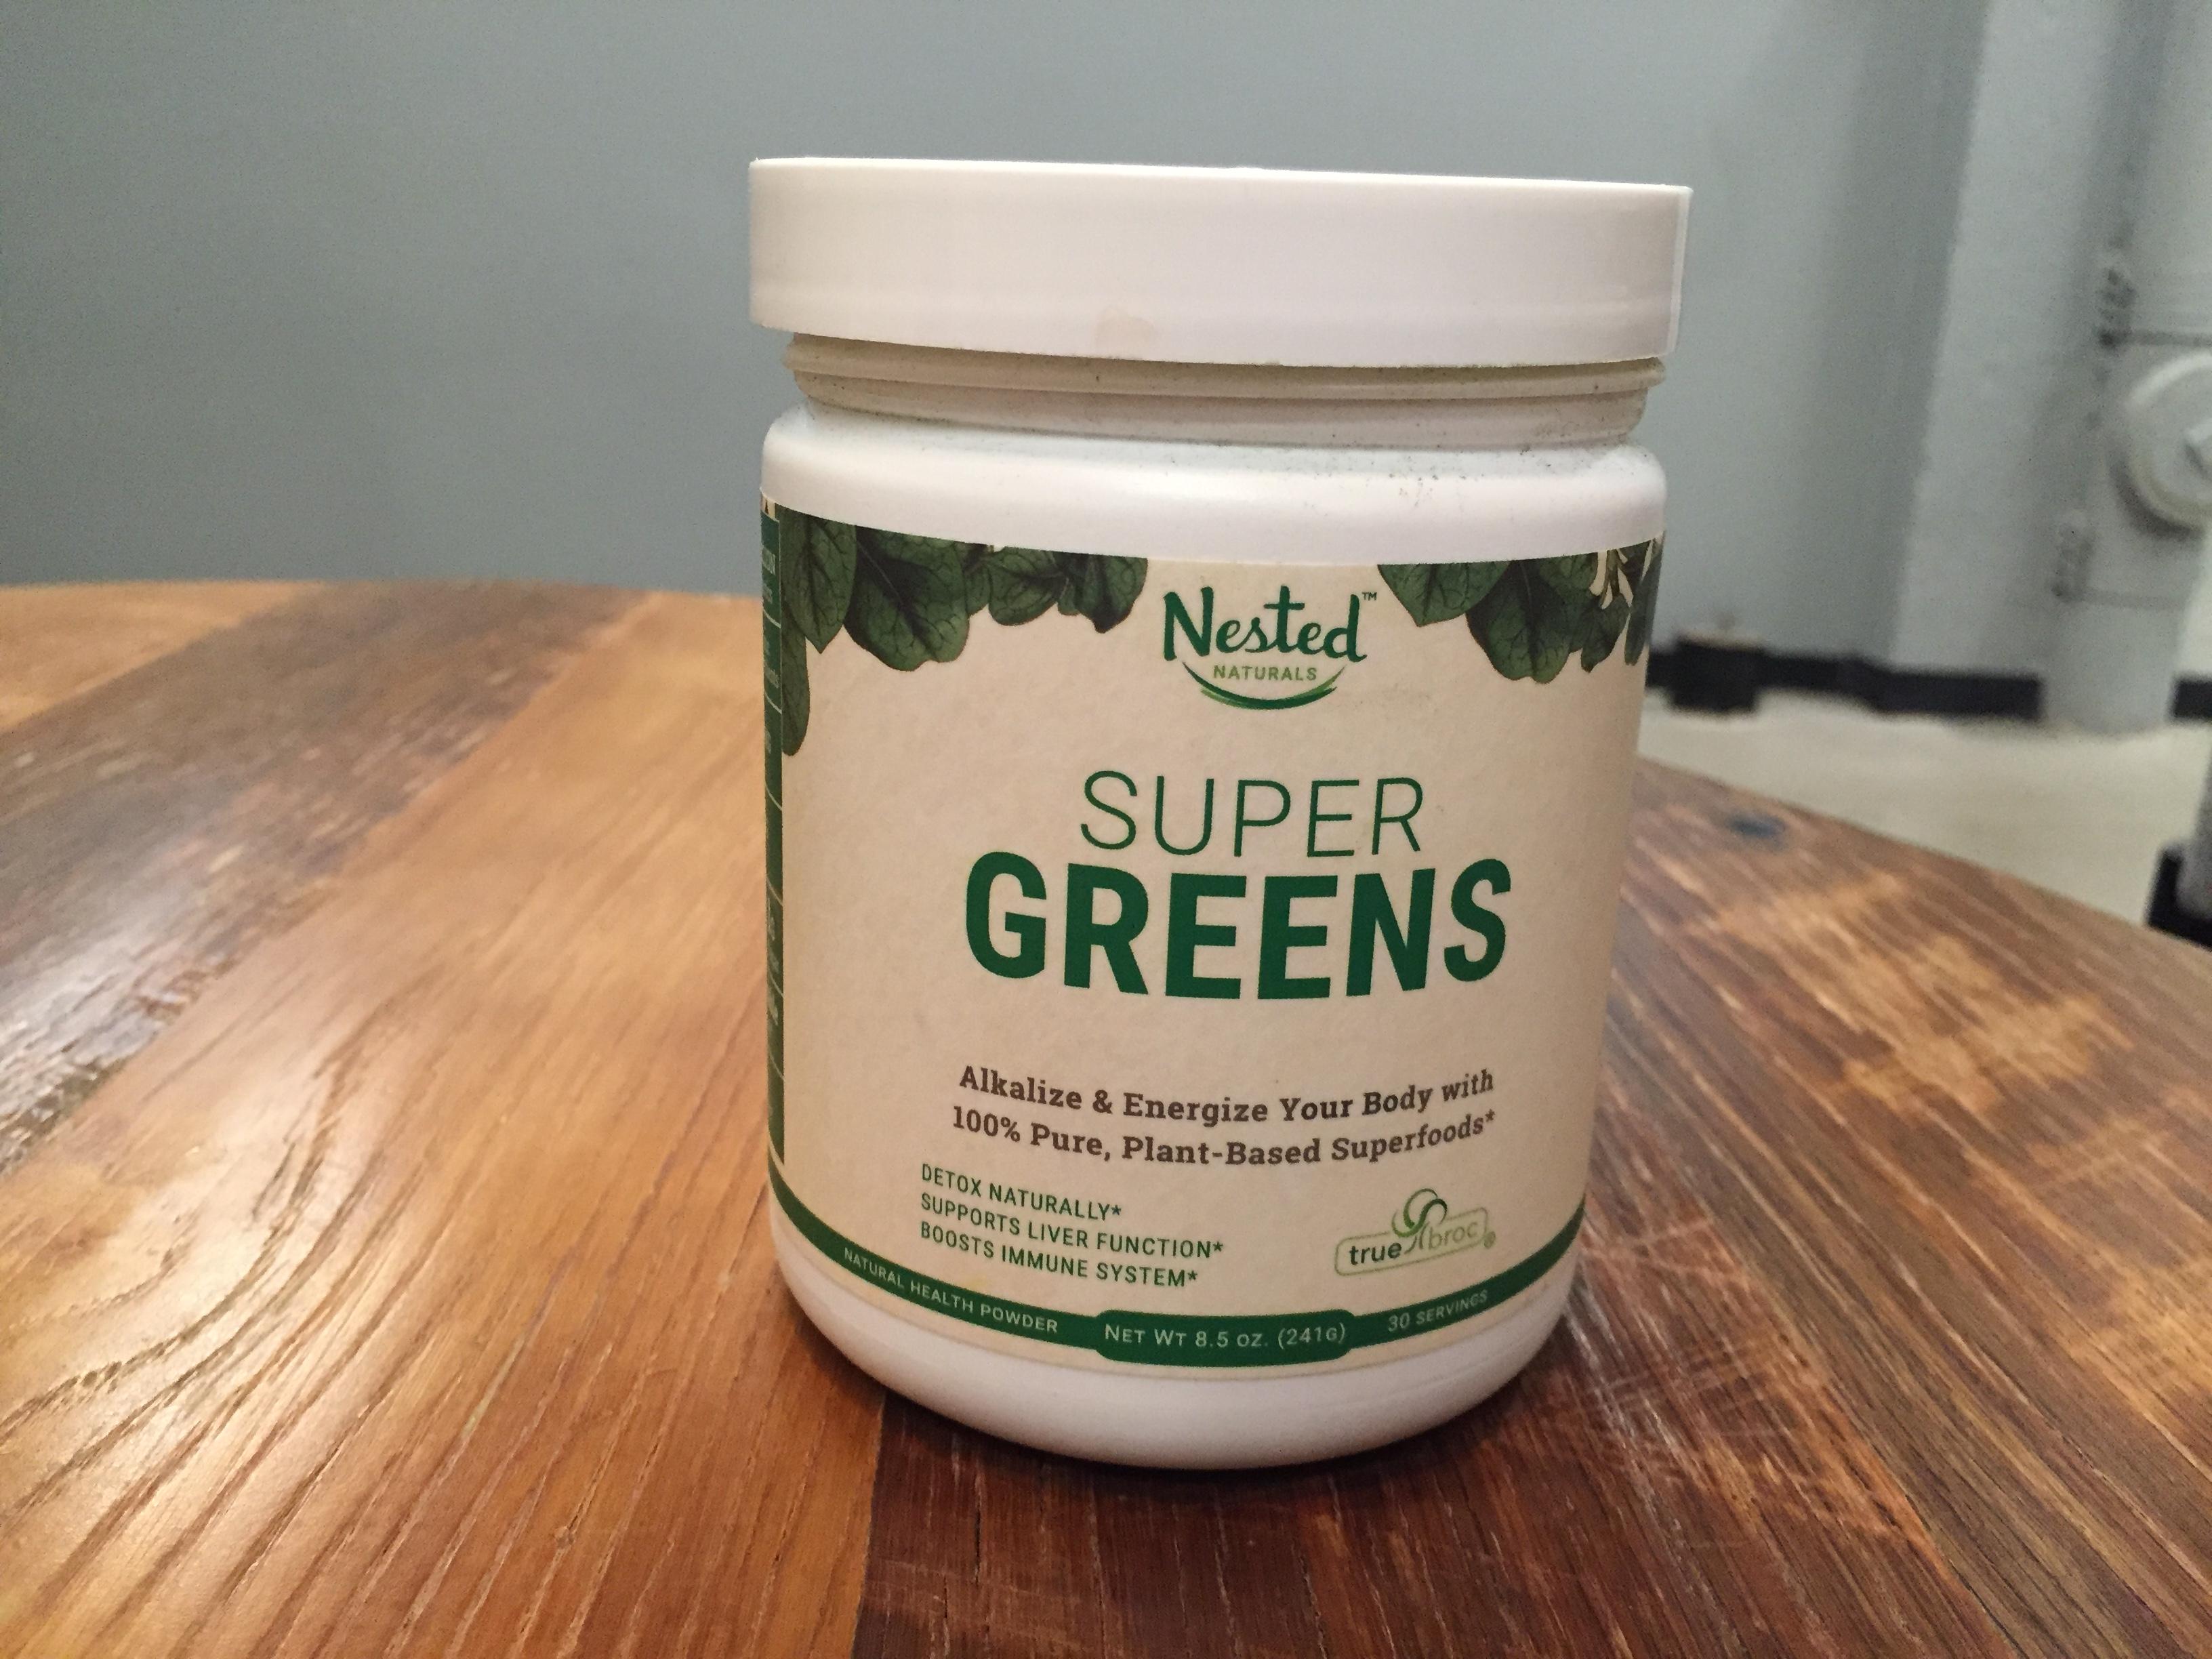 Nest Naturals Super Greens Price